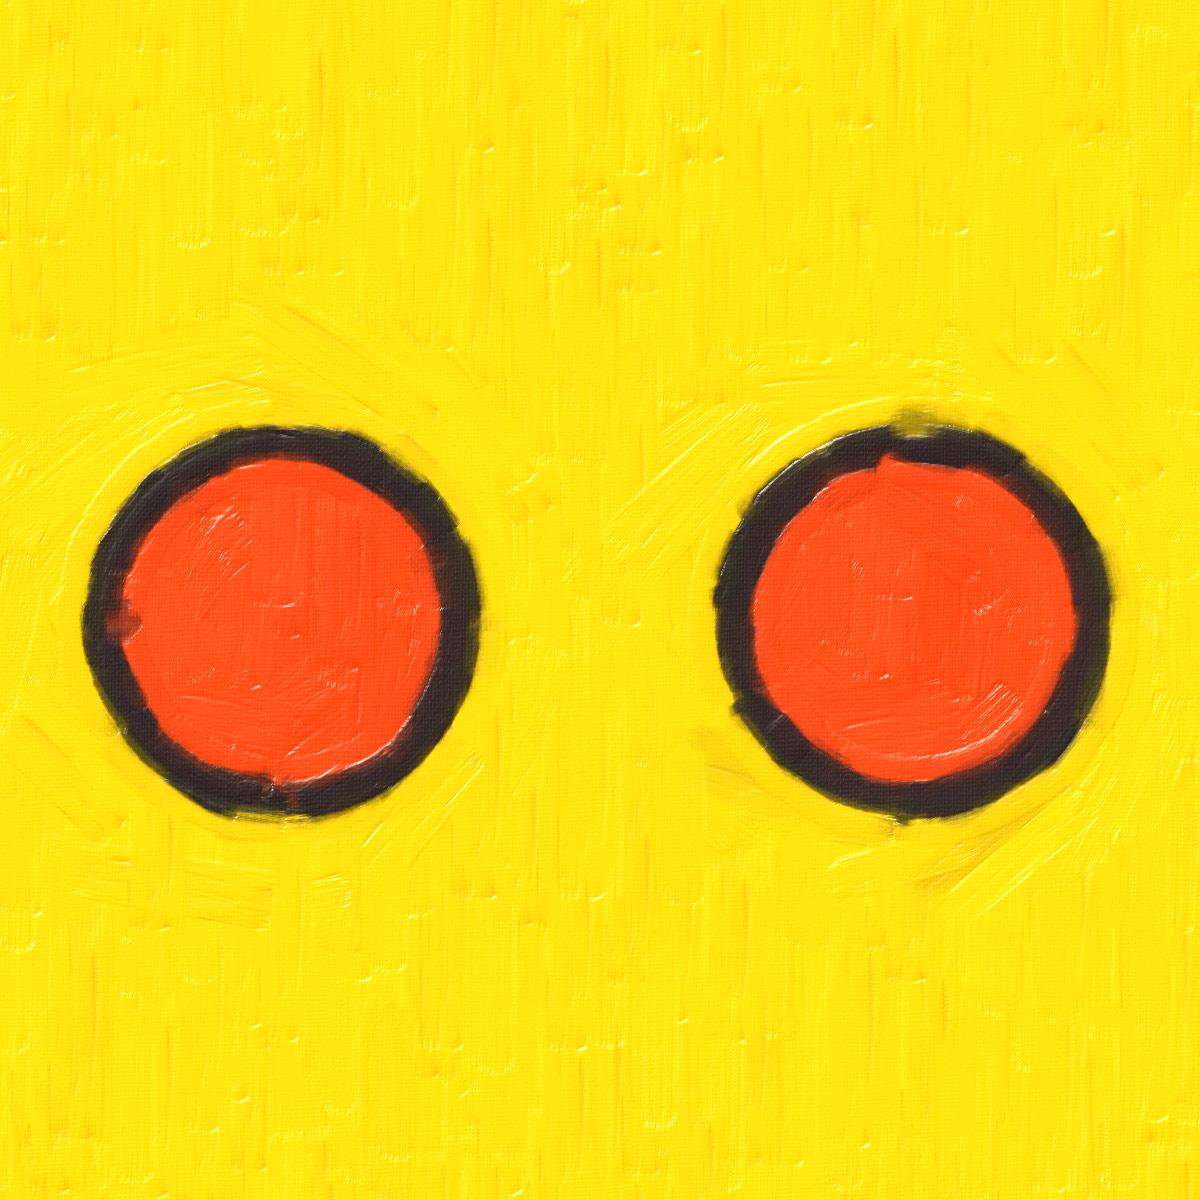 Pablo Pikachu